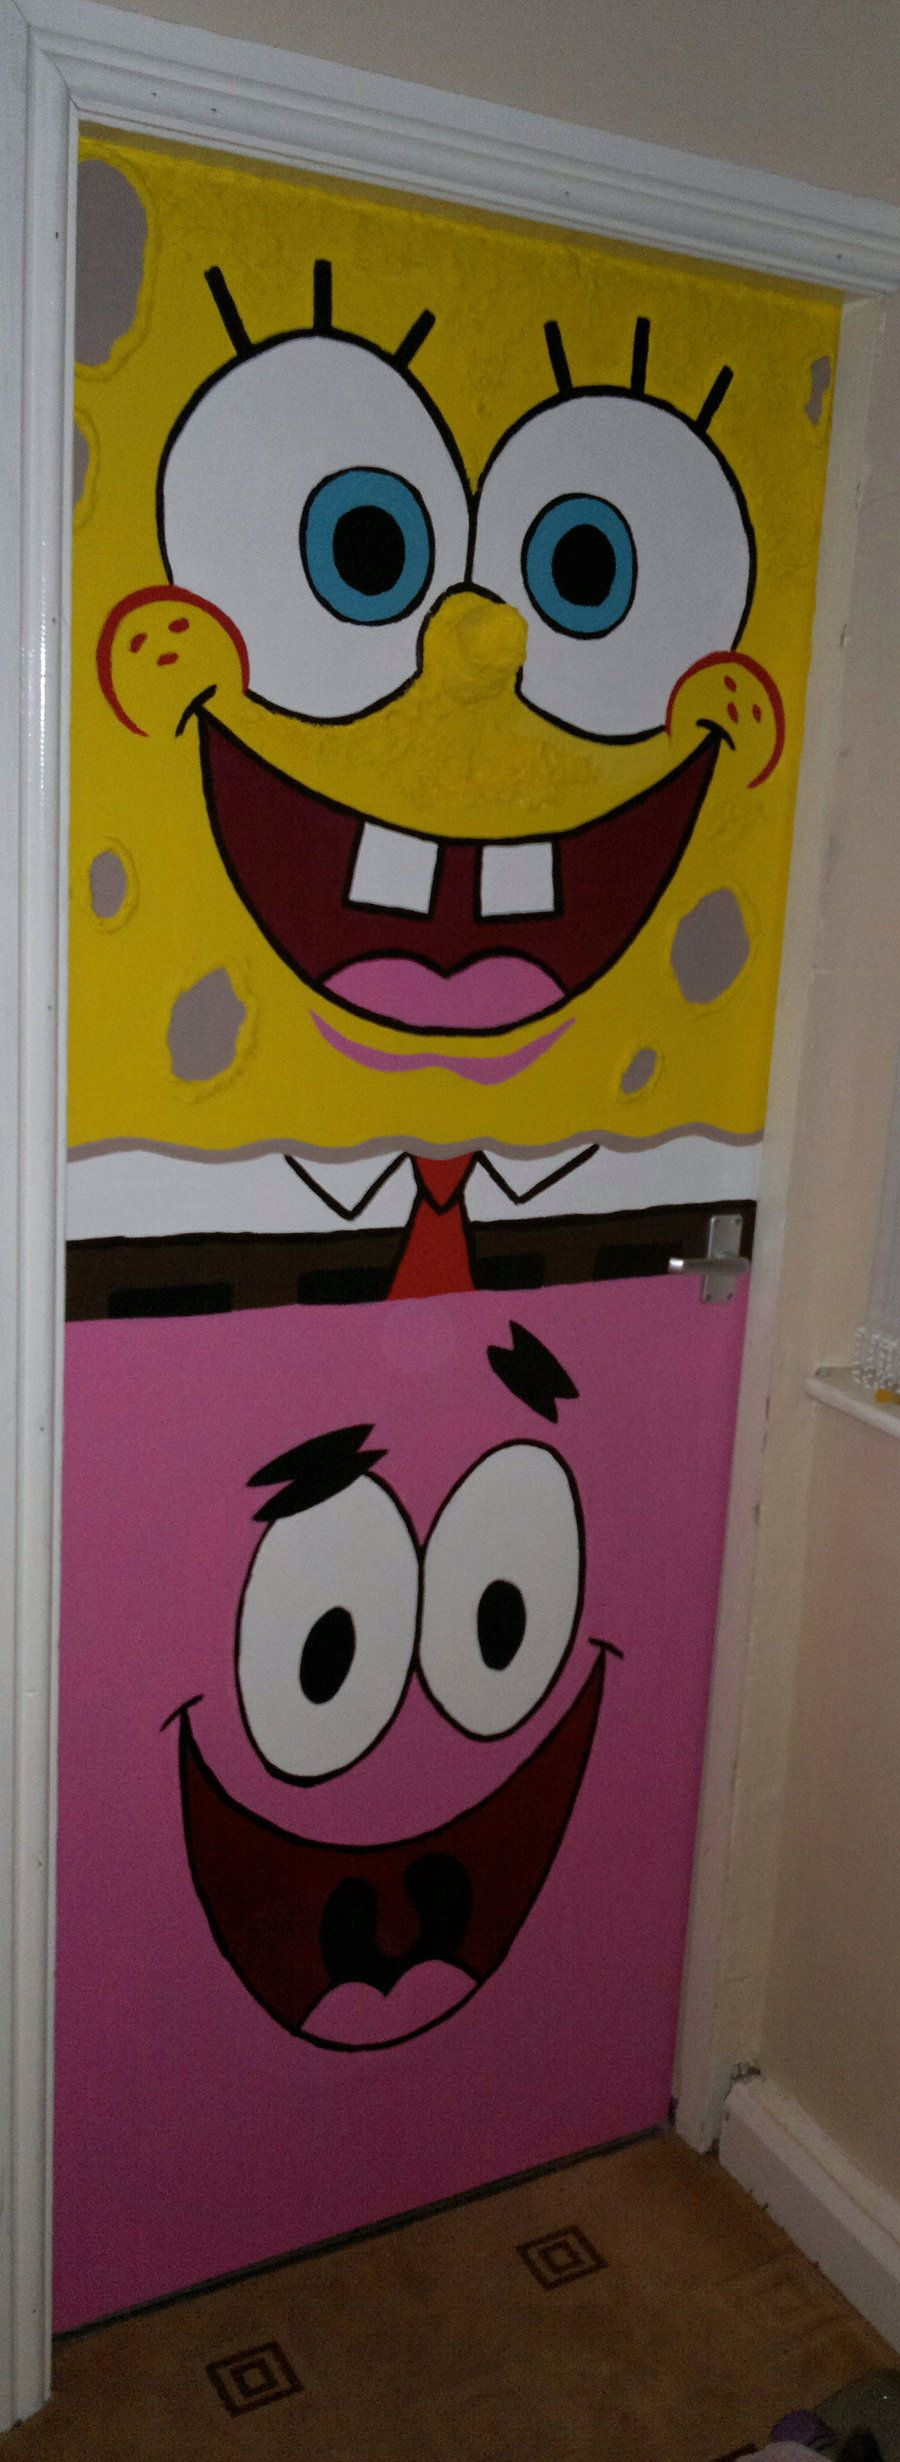 Spectacular Spongebob Bedroom Decorations